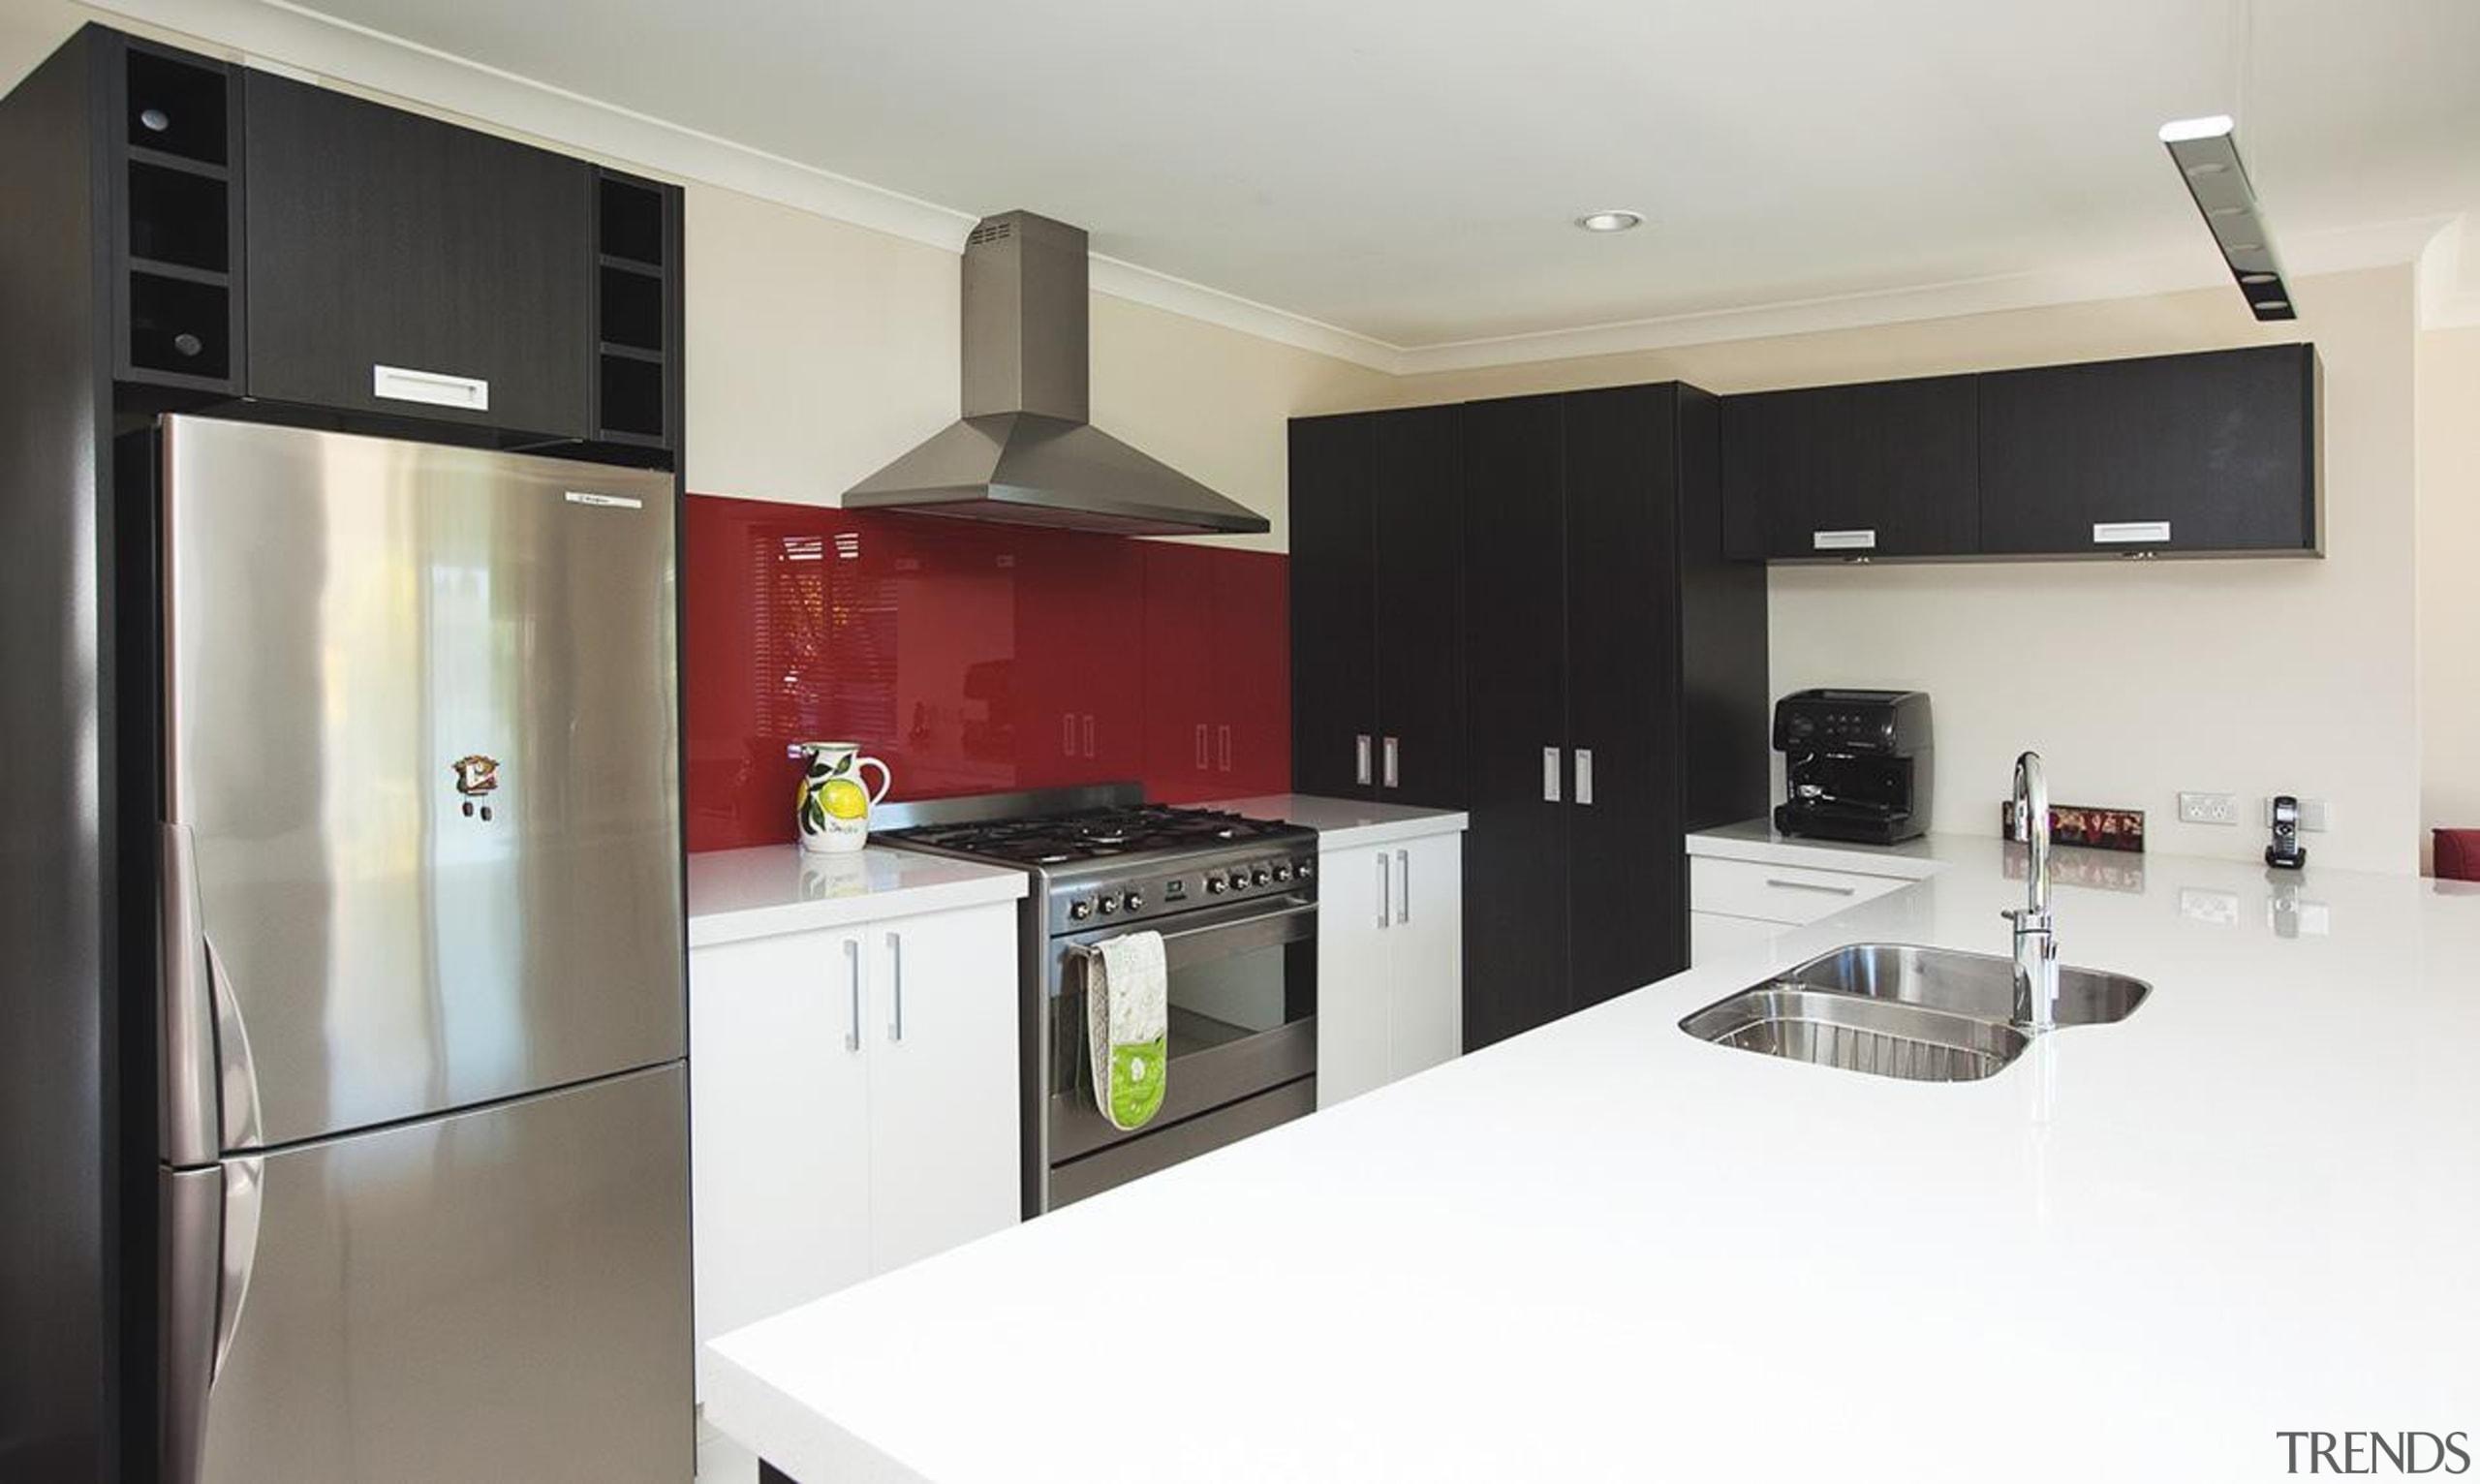 For more information, please visit www.gjgardner.co.nz countertop, cuisine classique, interior design, kitchen, property, real estate, room, white, gray